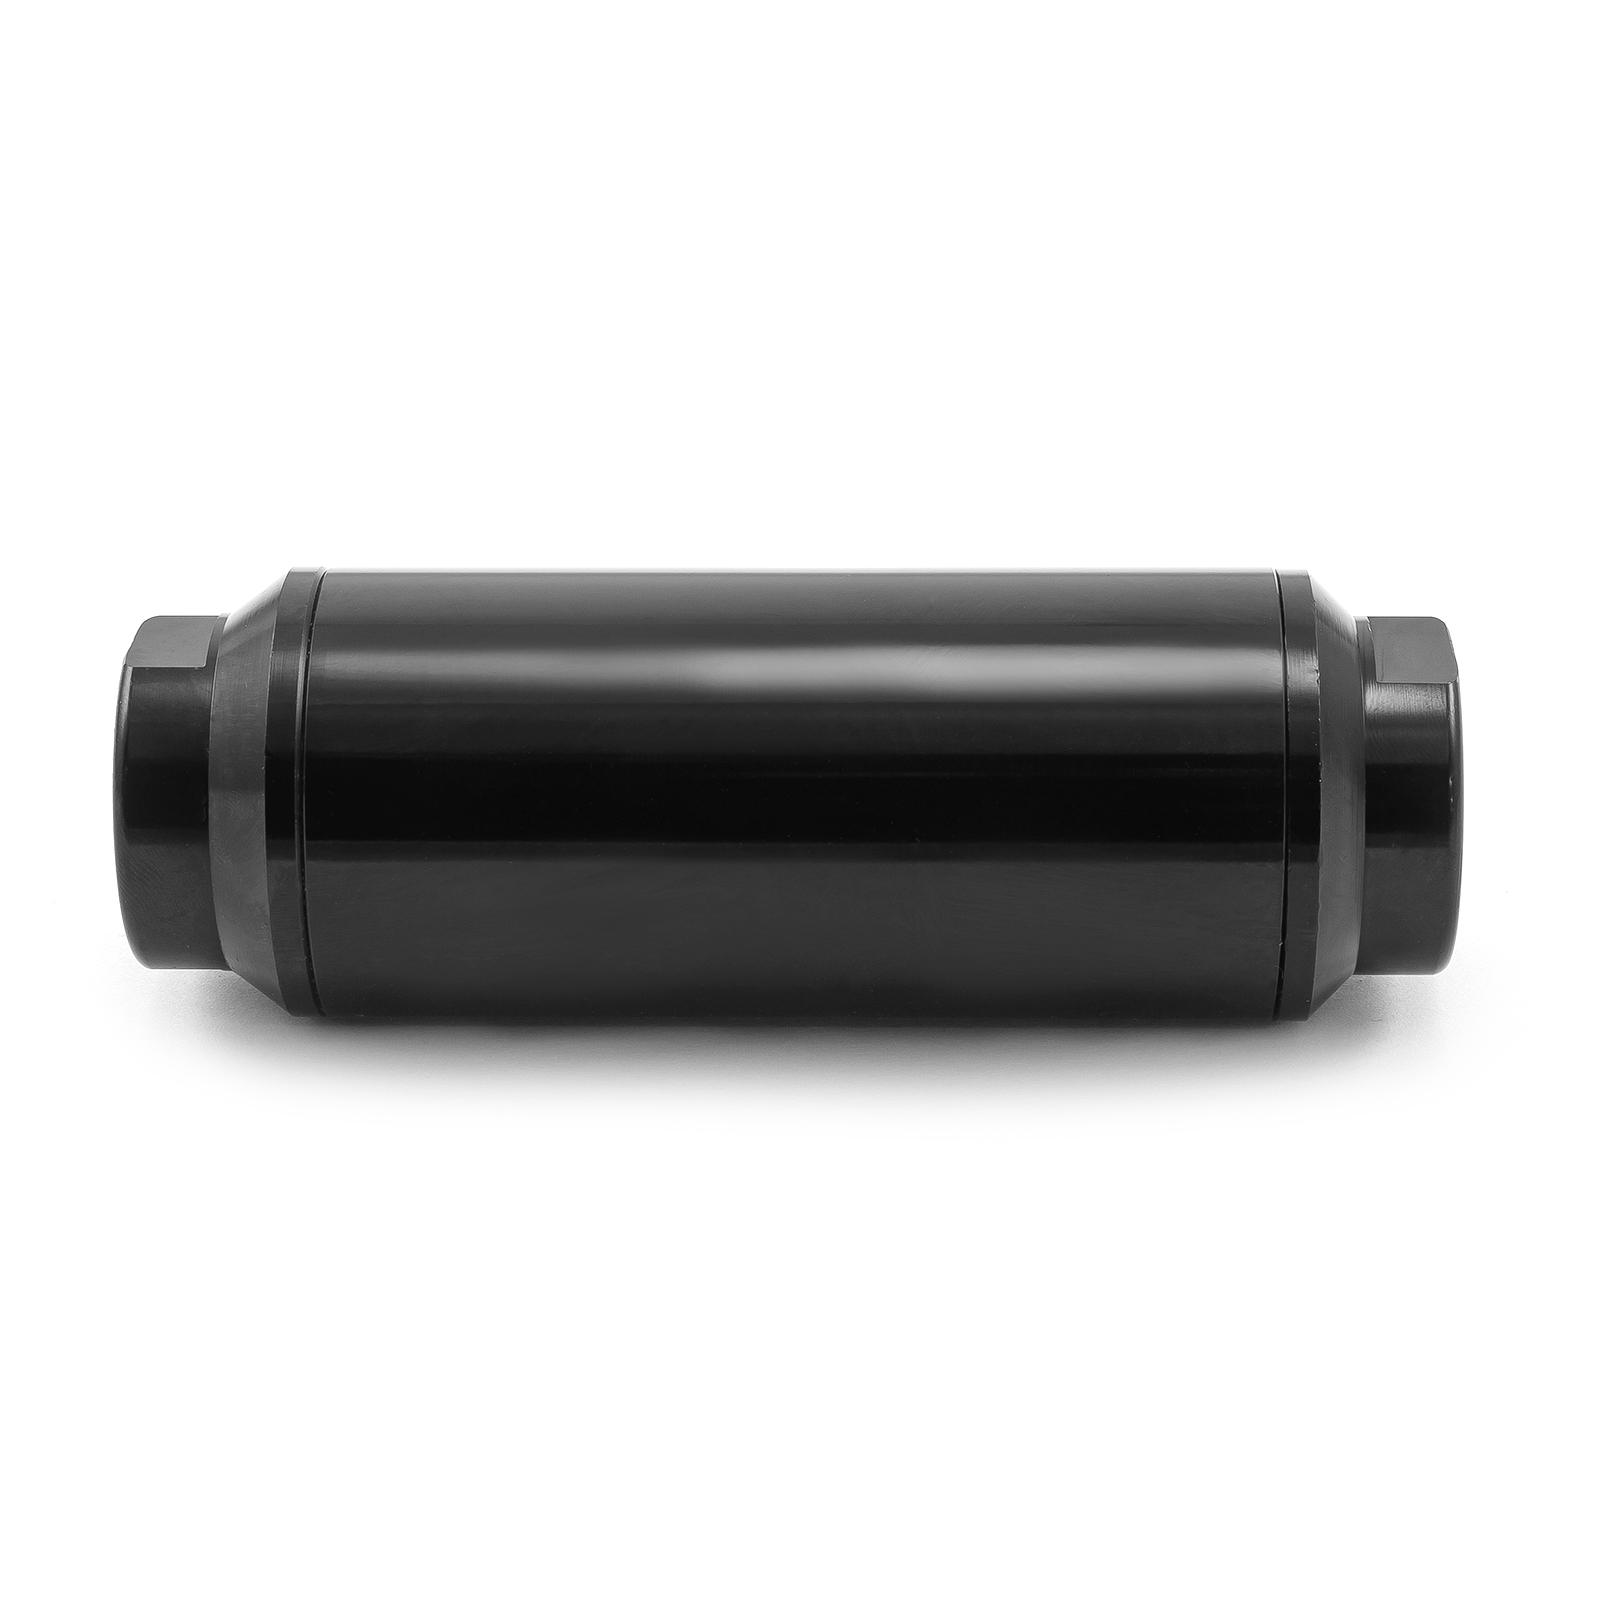 PCE® PCE132.1011 Inline Billet Aluminum Fuel Filter -6 AN Male